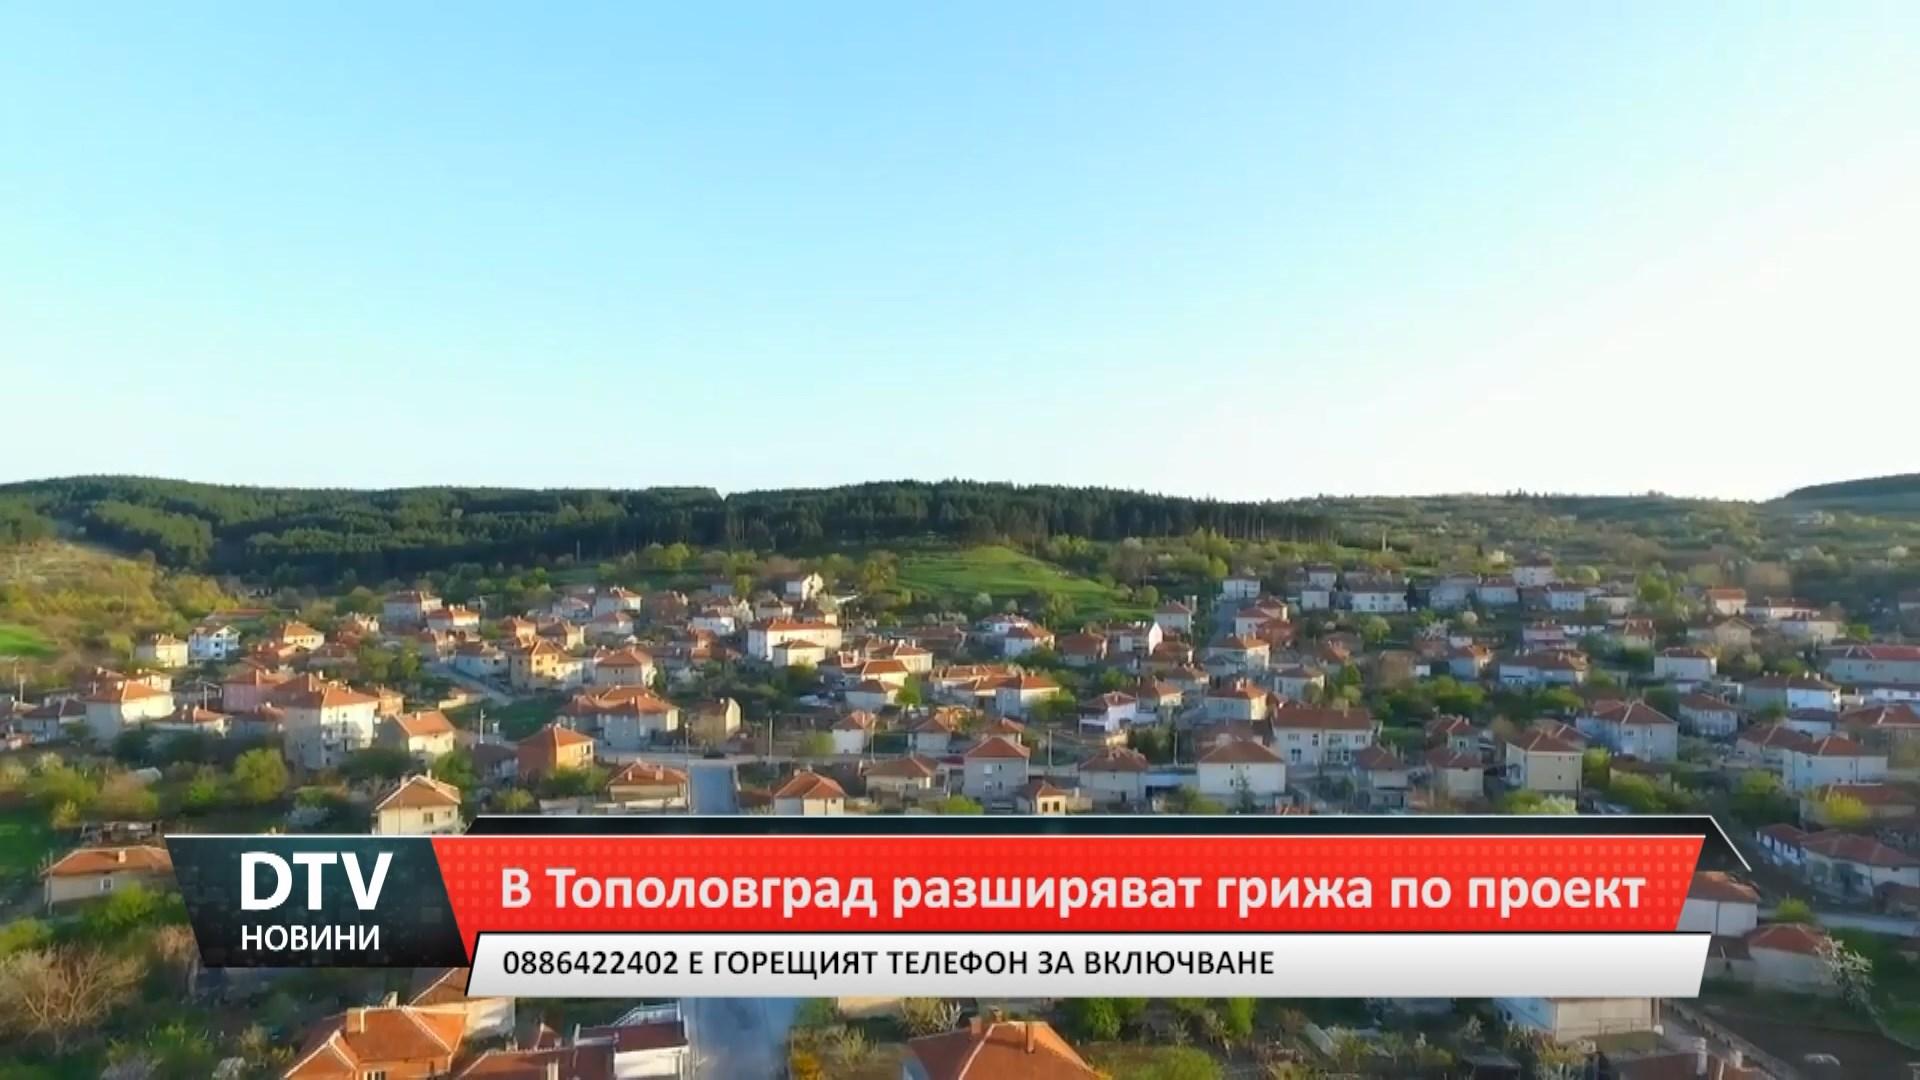 Горещ телефон в Тополовград. Там разширяват дейностите  по проект